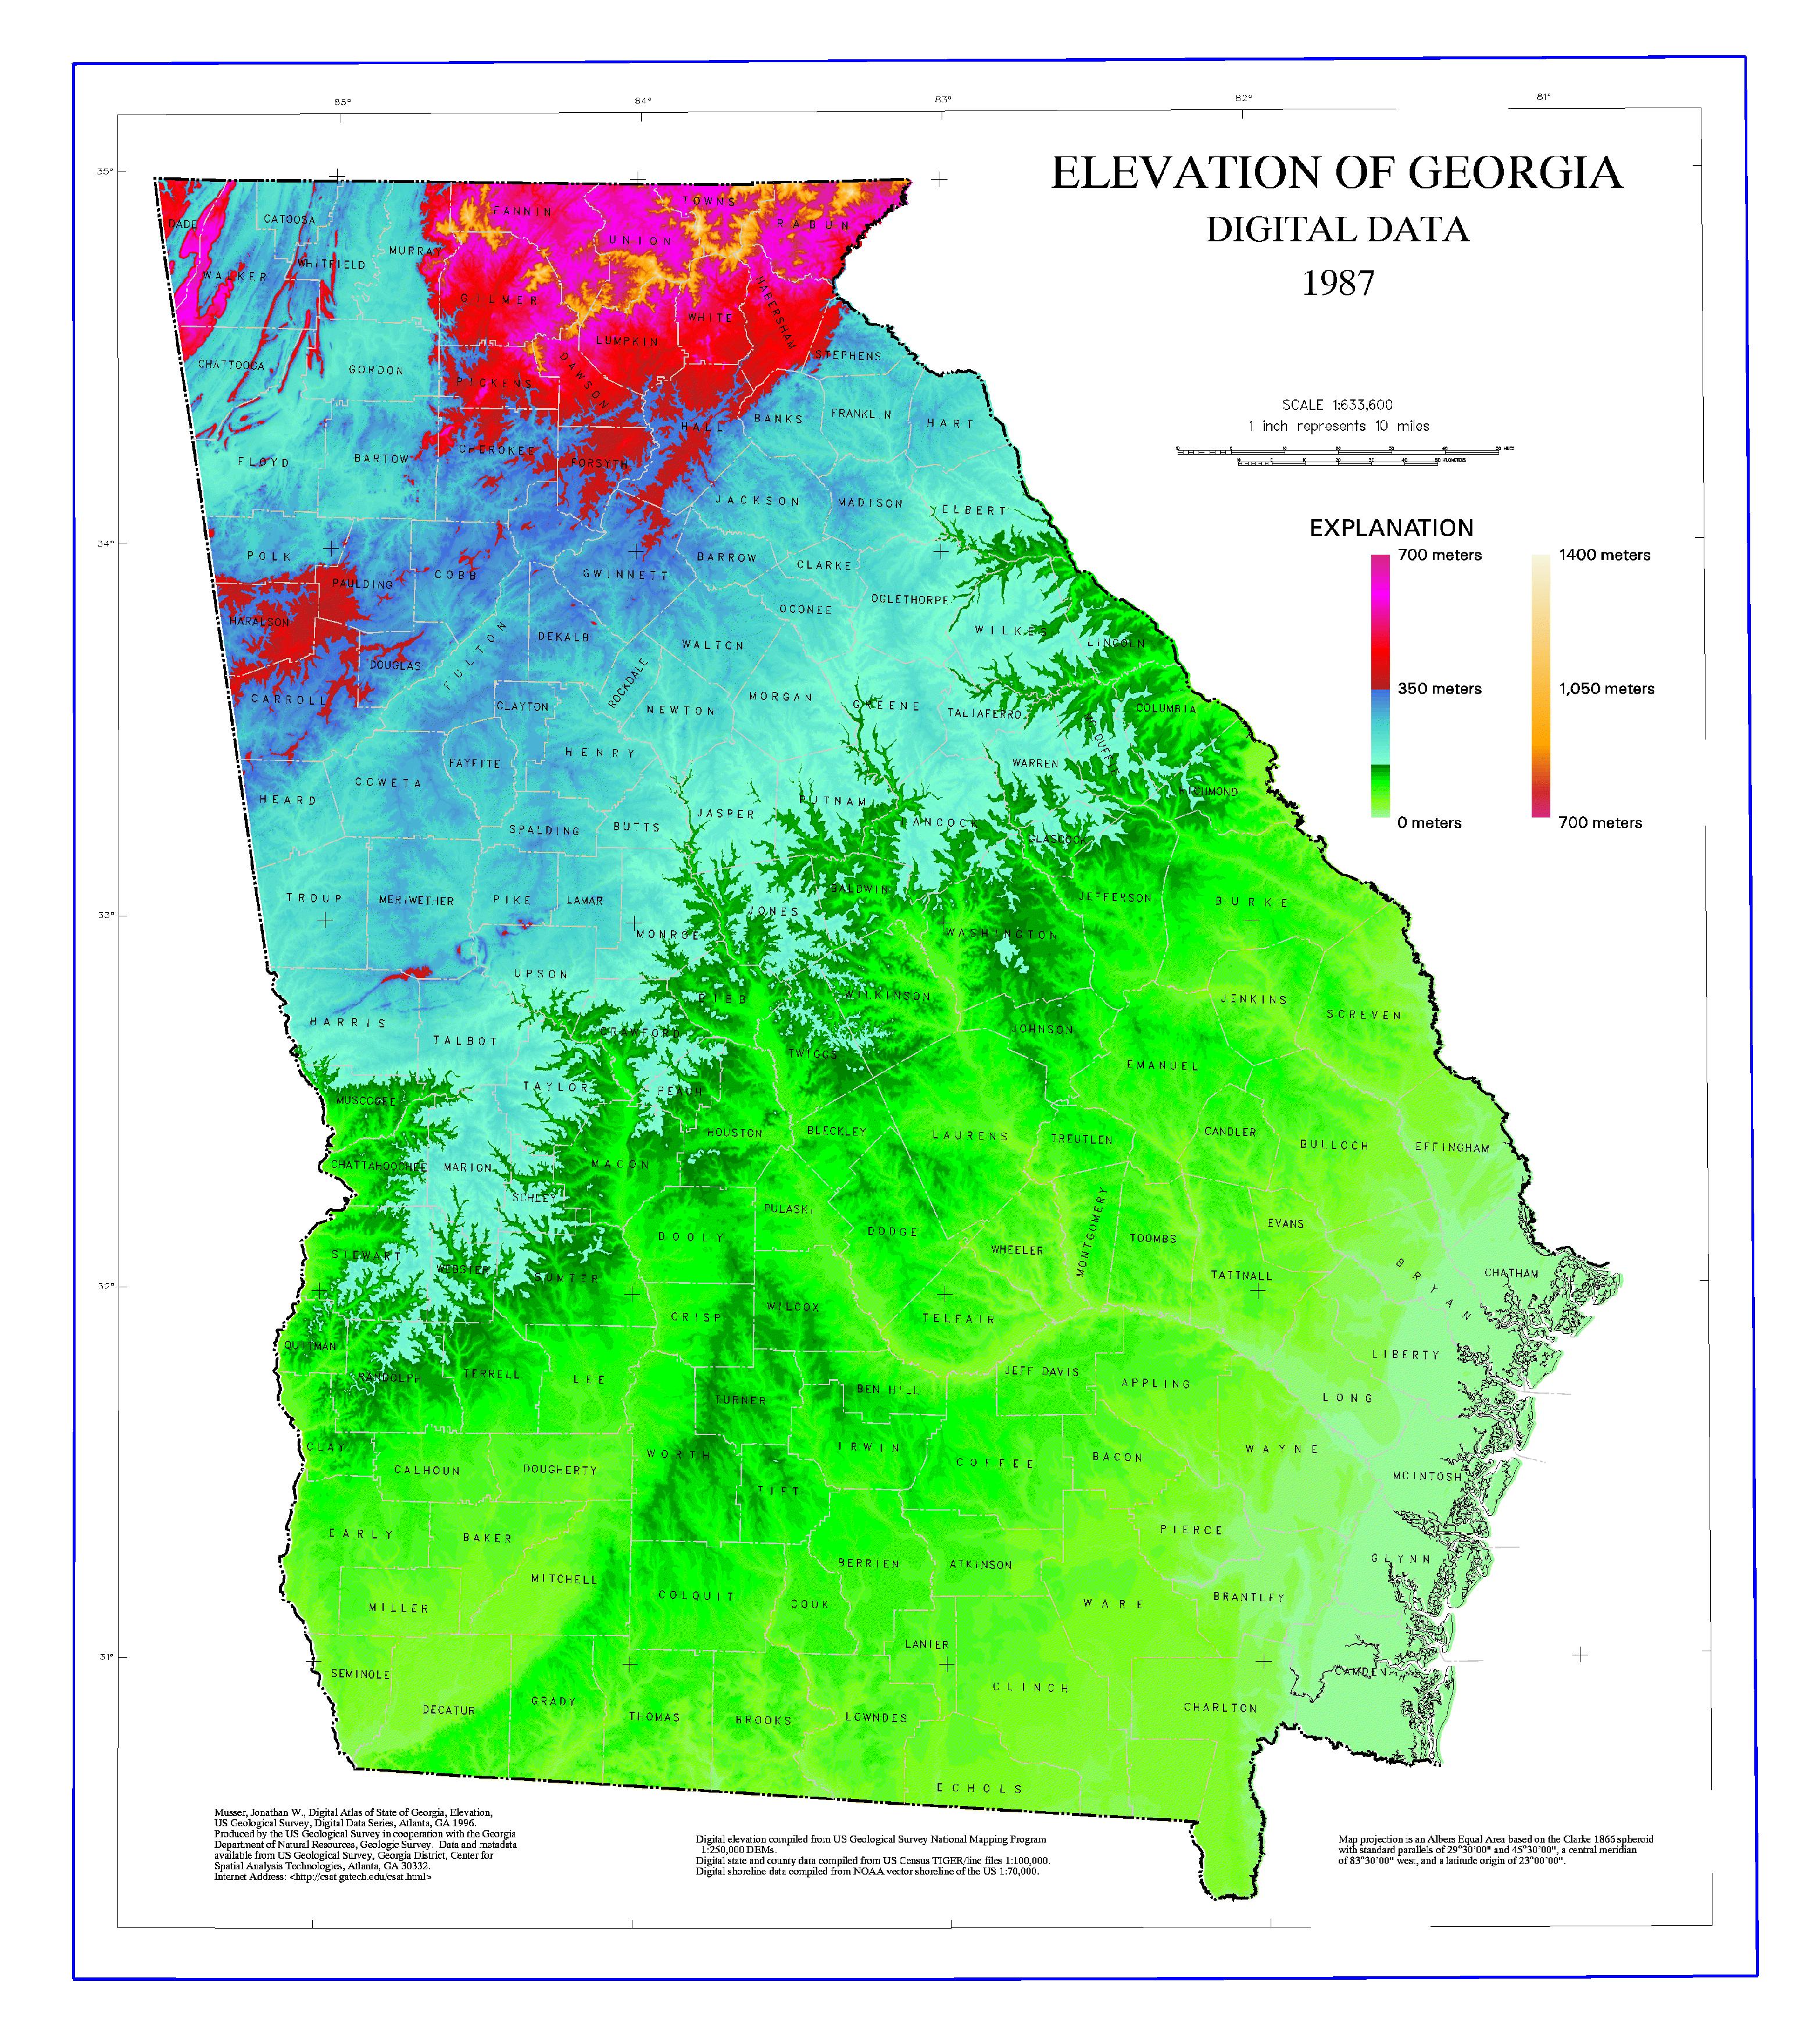 Geography Of Georgia (U.s. State) - Wikipedia - Map Of Northeast Florida And Southeast Georgia